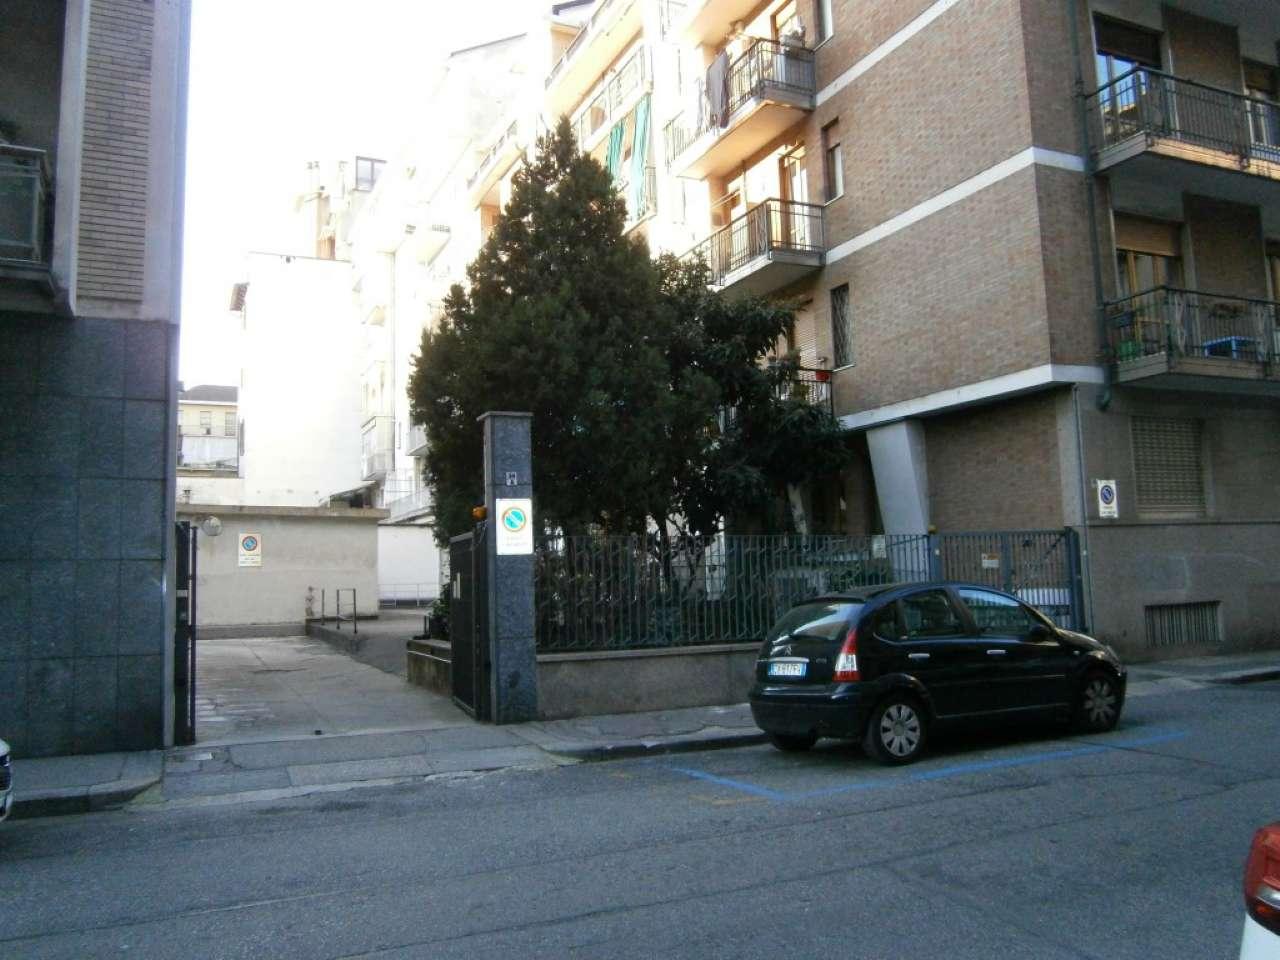 Foto 1 di Box / Garage via Collegno Giacinto 34, Torino (zona Cit Turin, San Donato, Campidoglio)